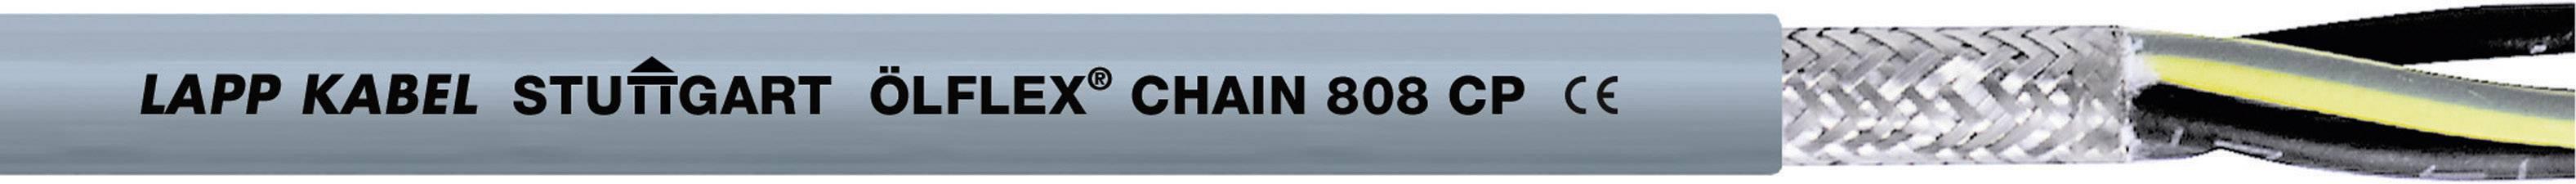 Žíla kabelu LappKabel ÖLFLEX CHAIN 808 CP 3G0,5 (1027752), 3x 0,5 mm², polyurethan, Ø 6,1 mm, stíněný, 50 m, š